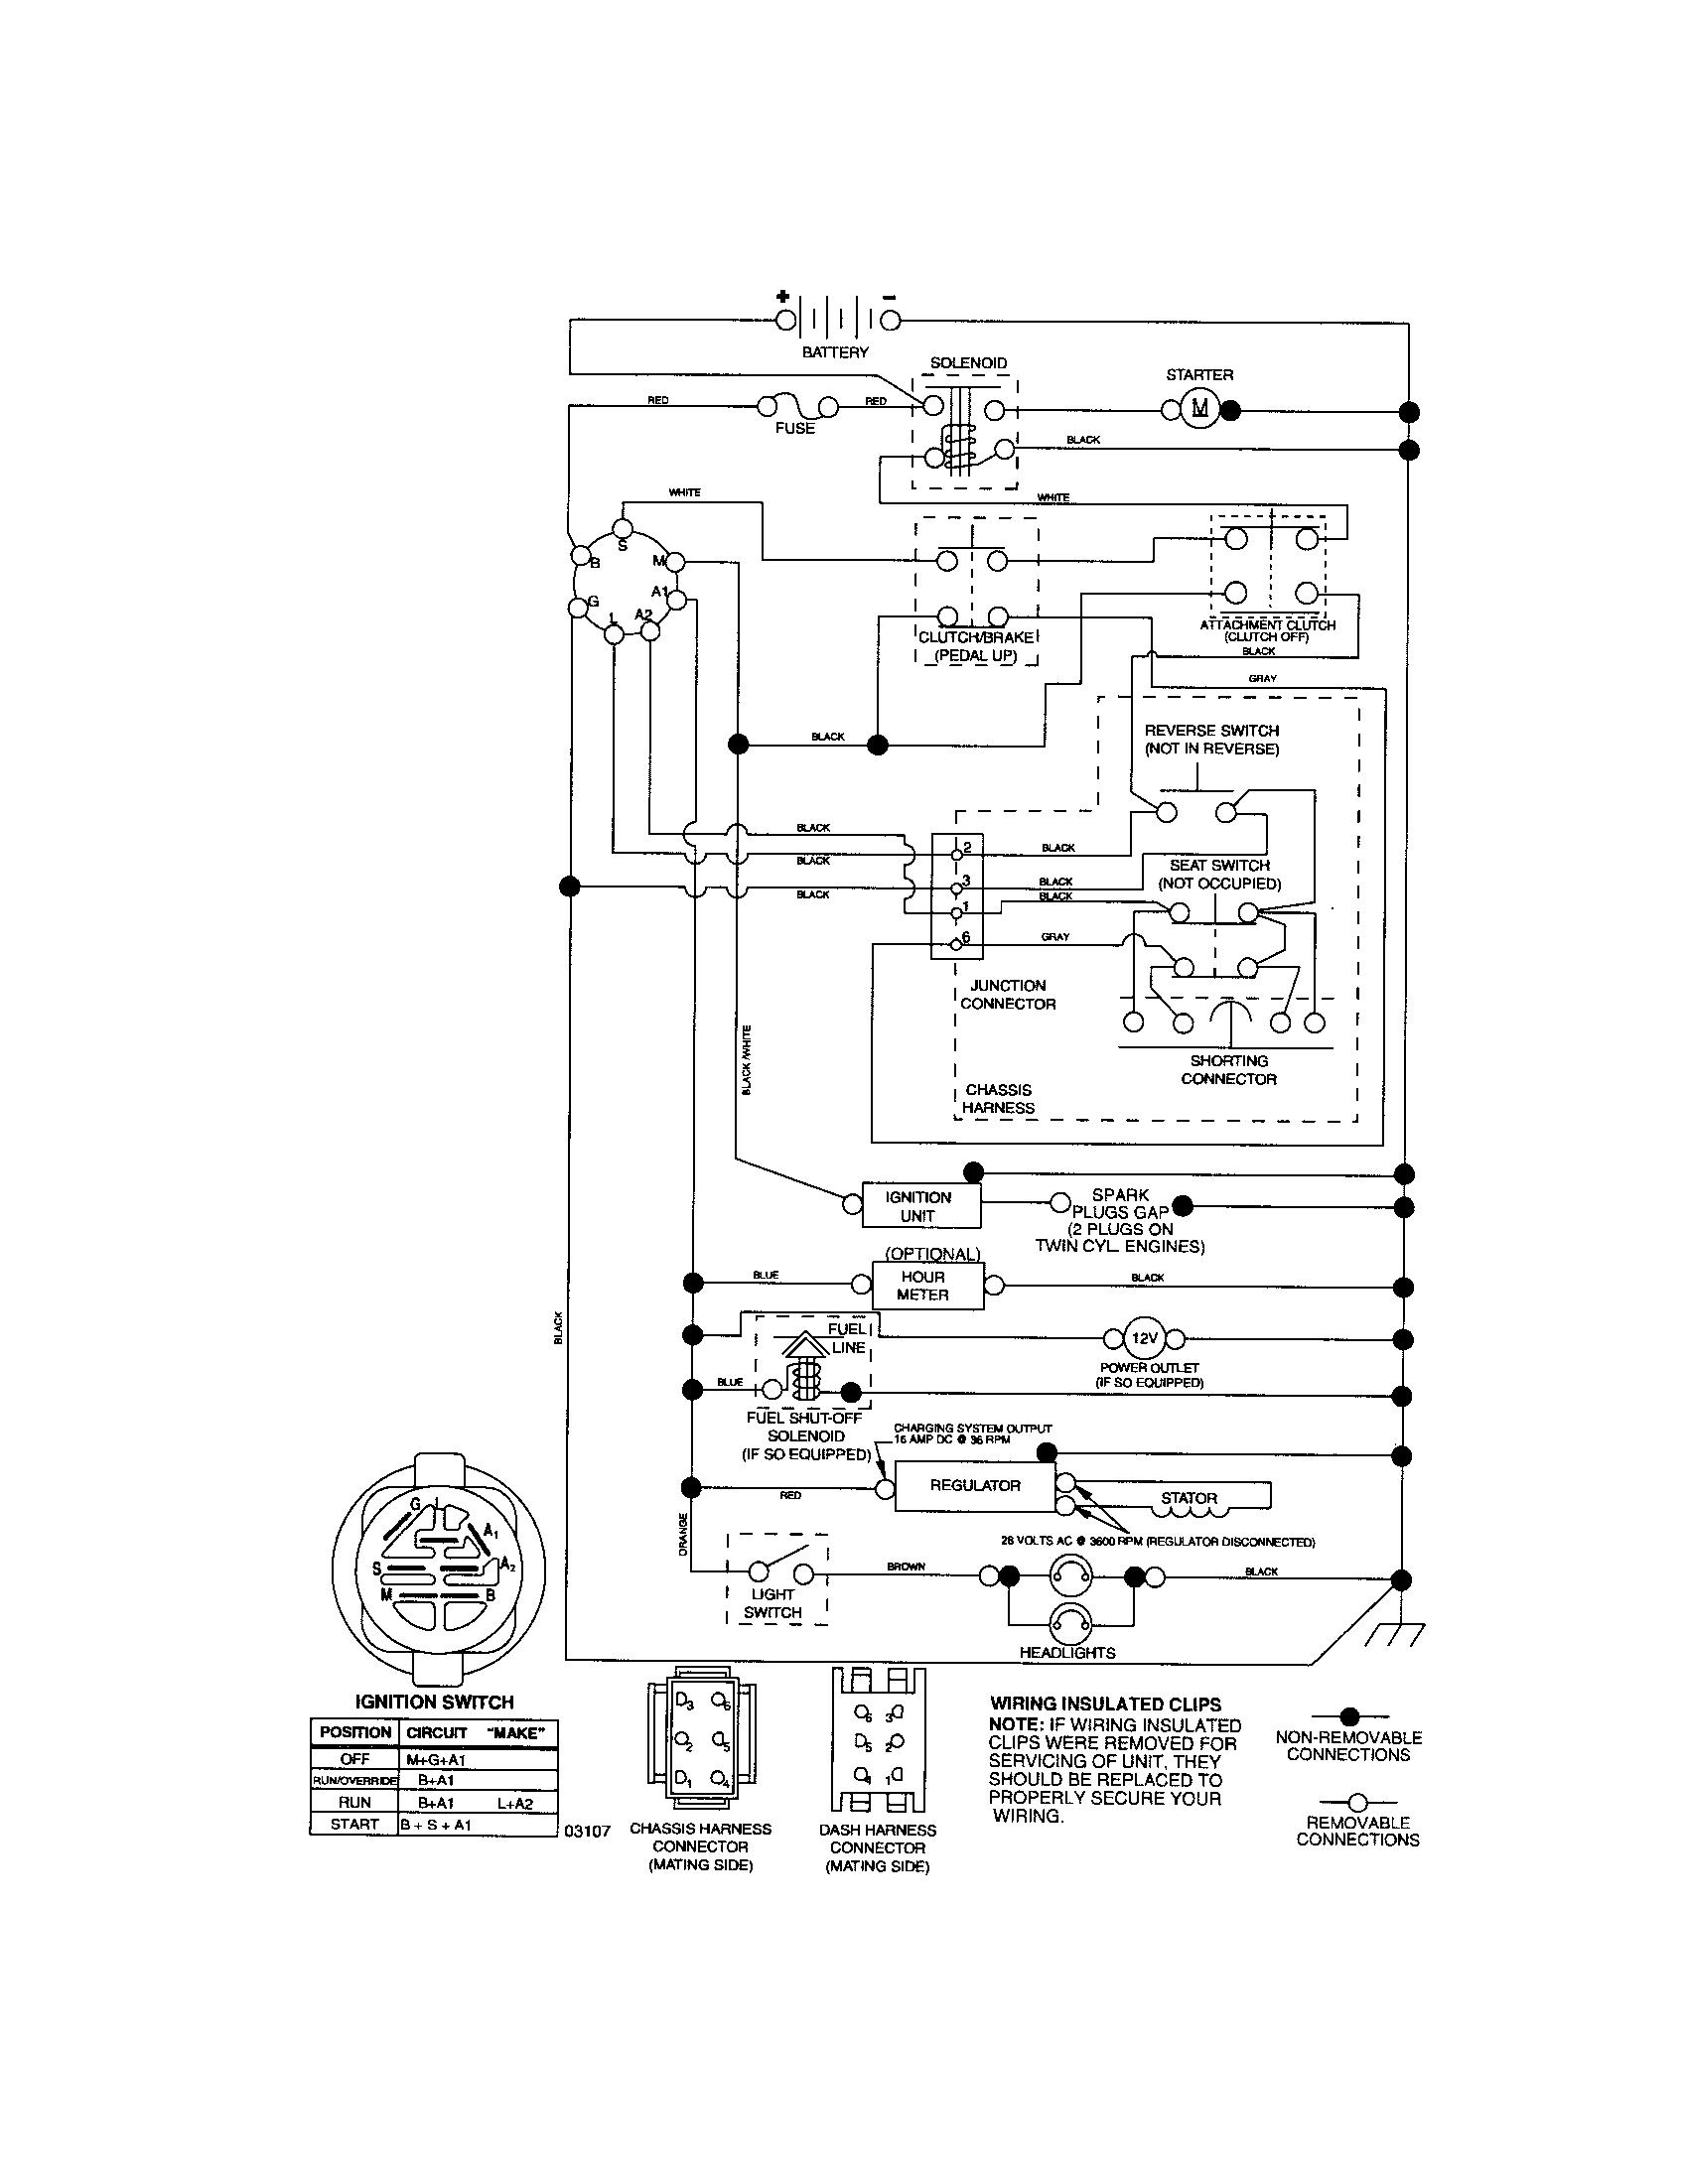 wiring diagram for craftsman t1200